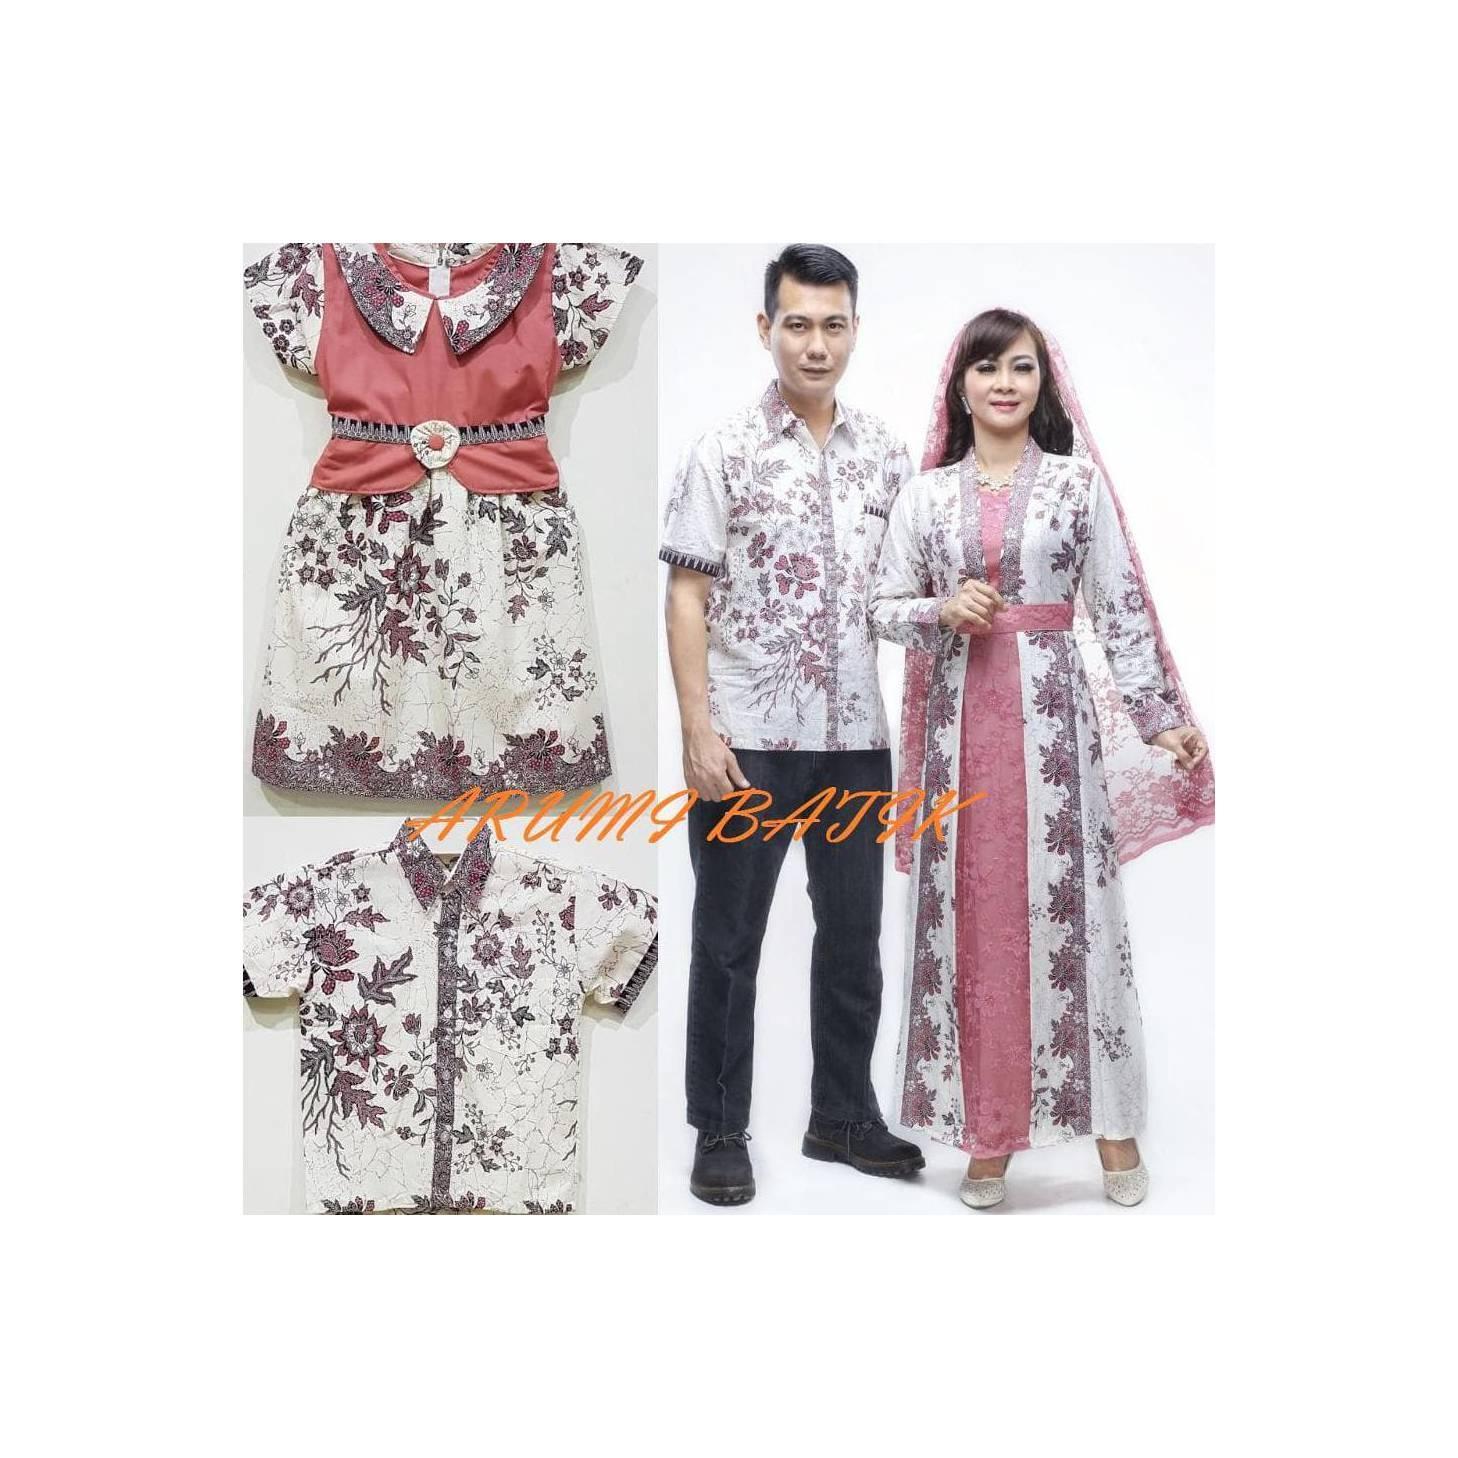 Murah Gamis Baju Muslim Long Maxi Dress Batik 1601 Fanta Big Size